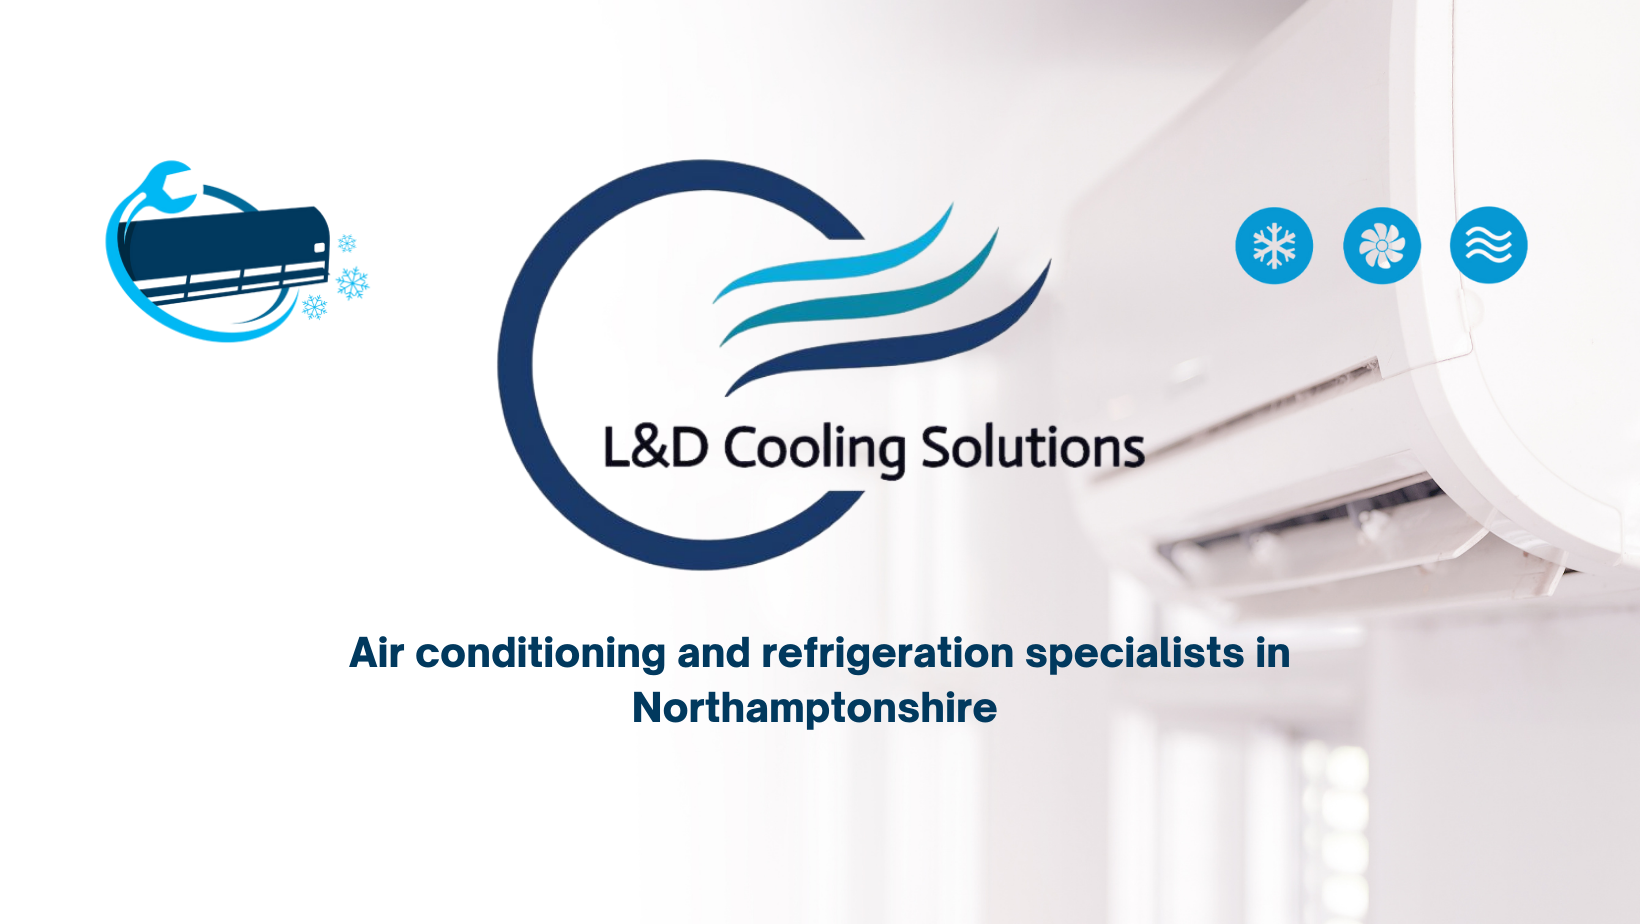 L&D Cooling Solutions